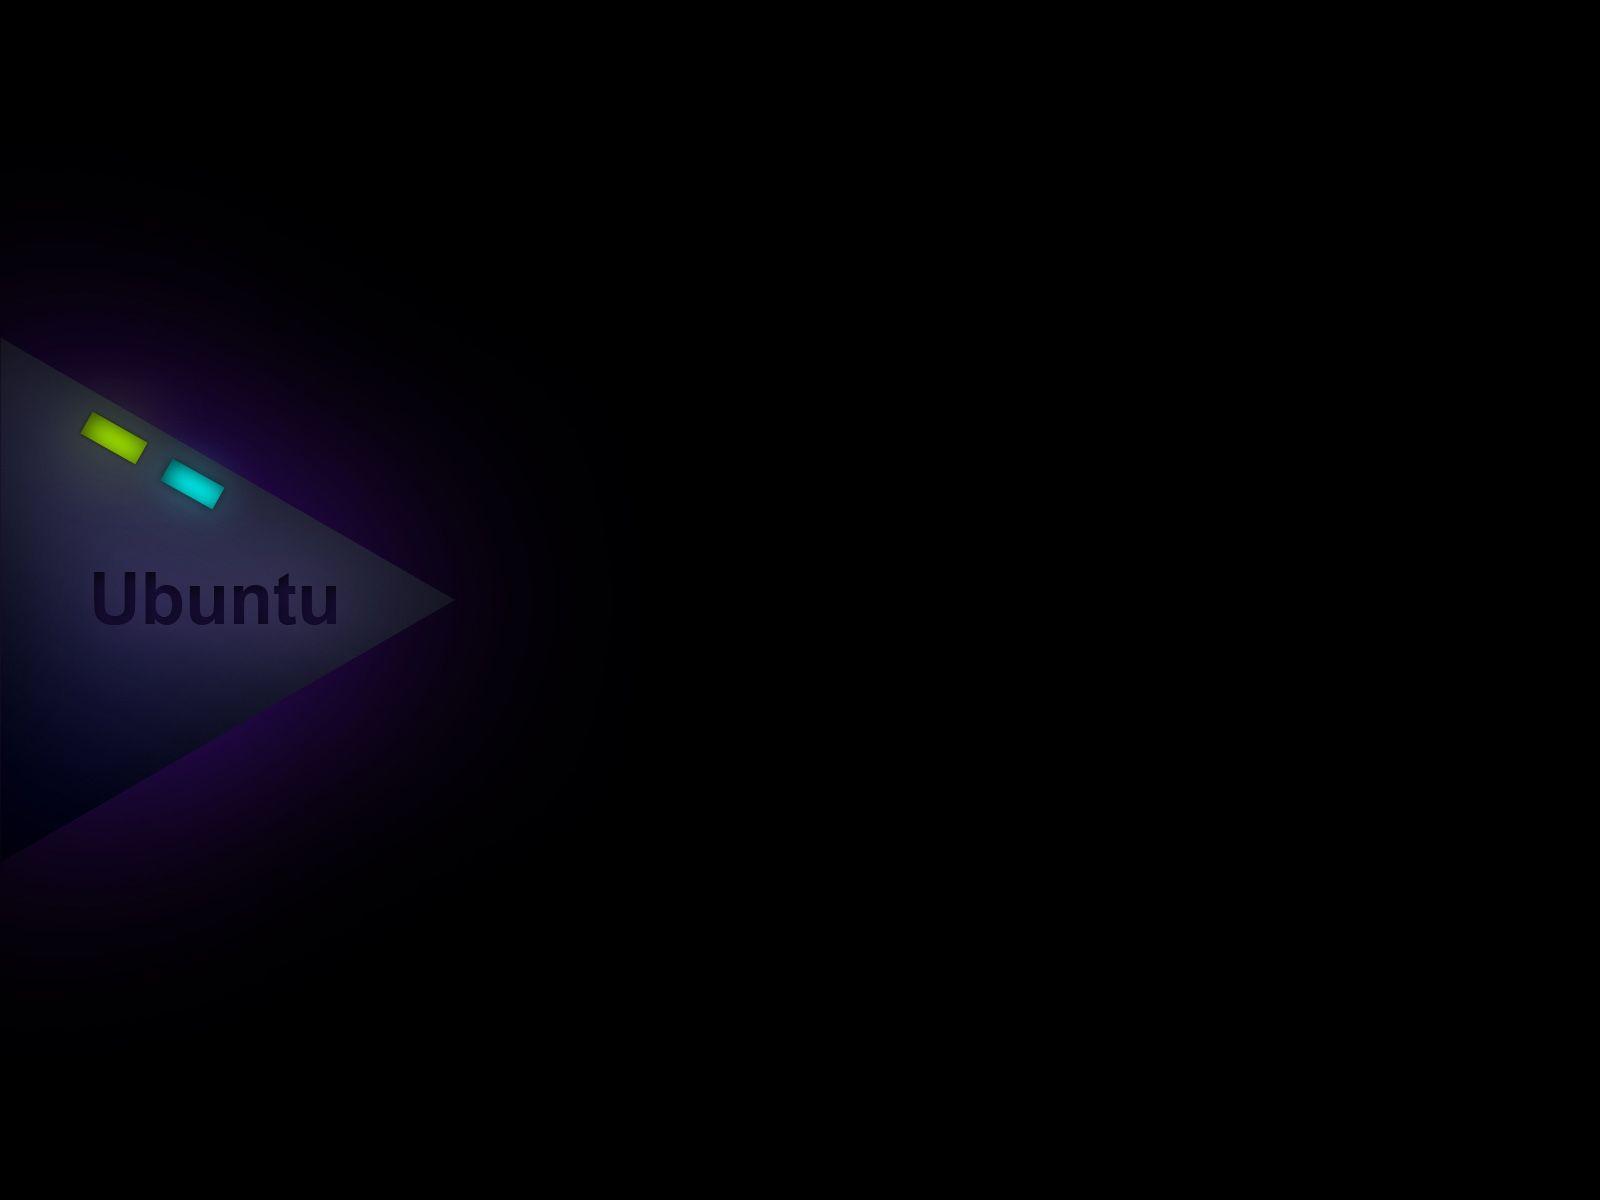 Ubuntu Dark Minimal Background Minimalism Dark Hd Wallpaper